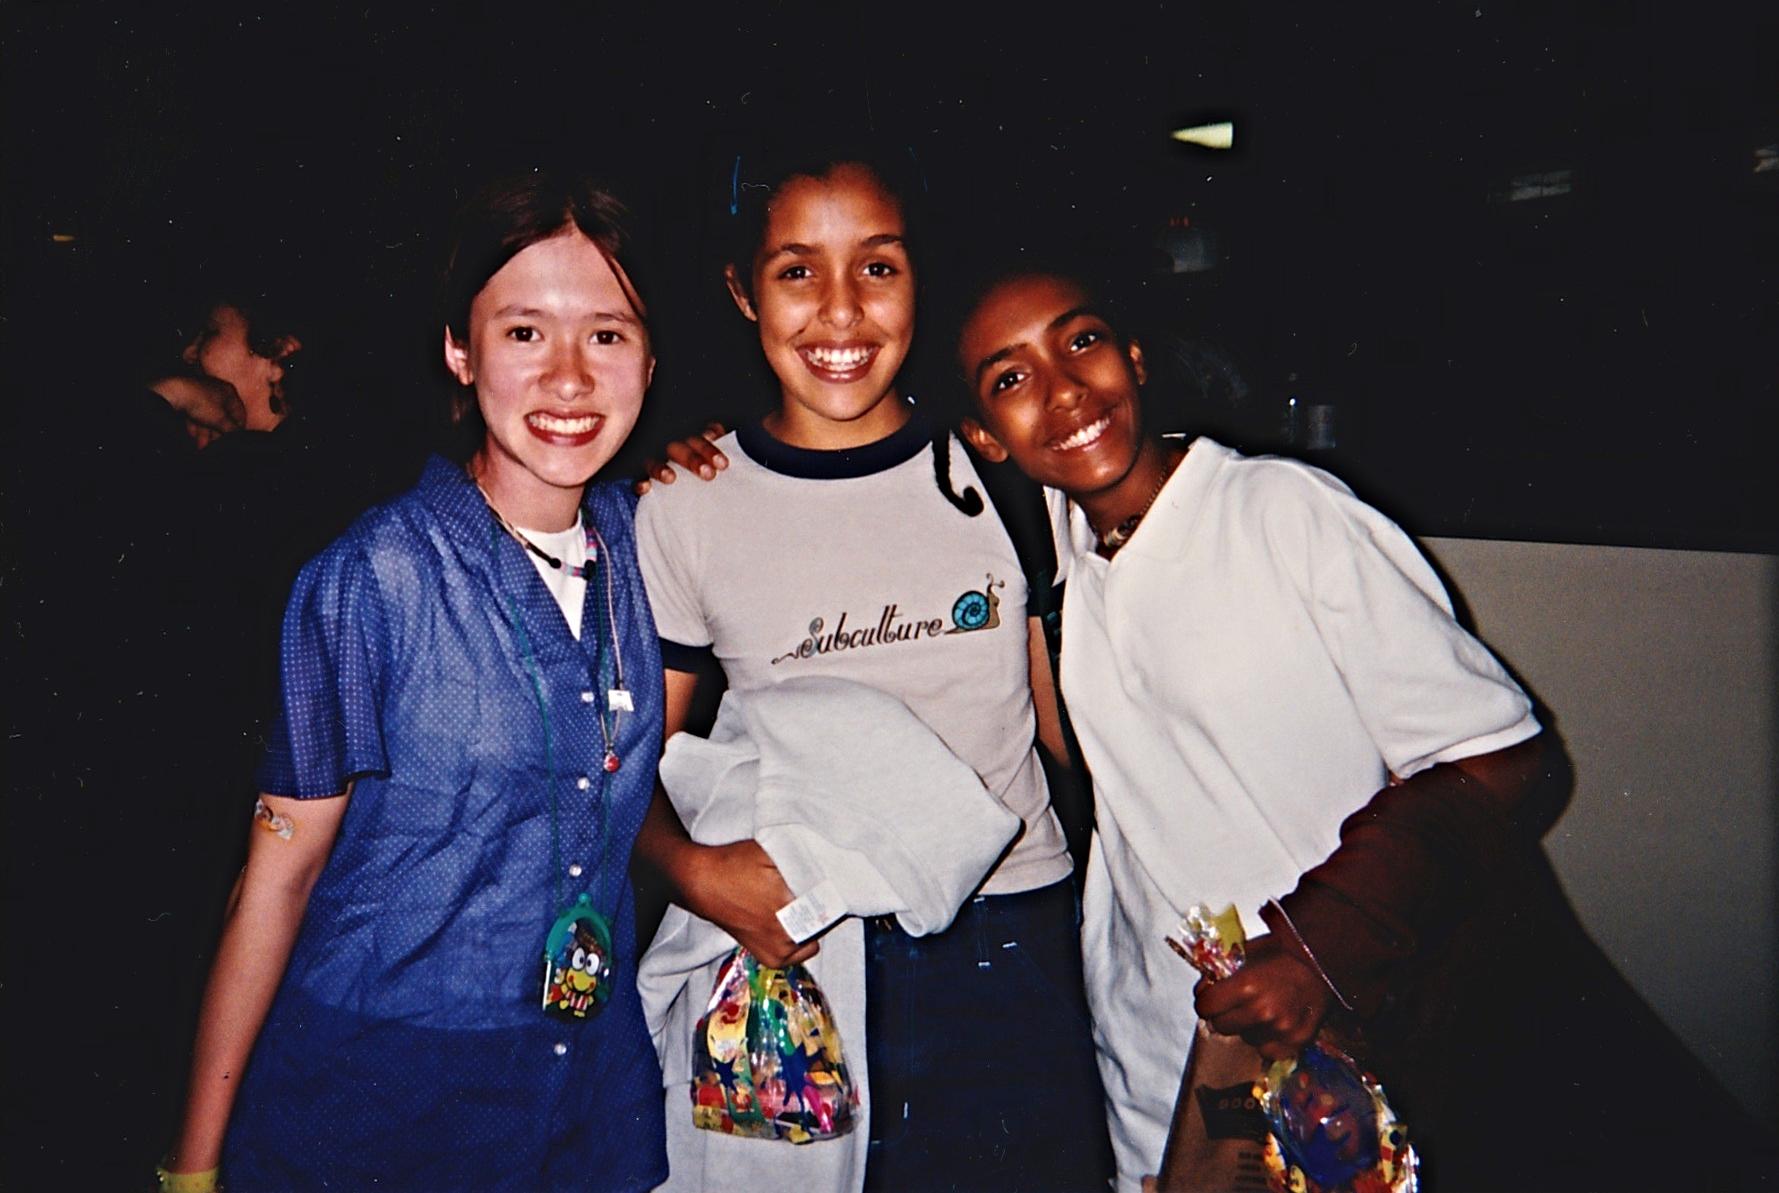 My 13th bowling birthday party: Me, Tak & Jazzy J (June 1995)